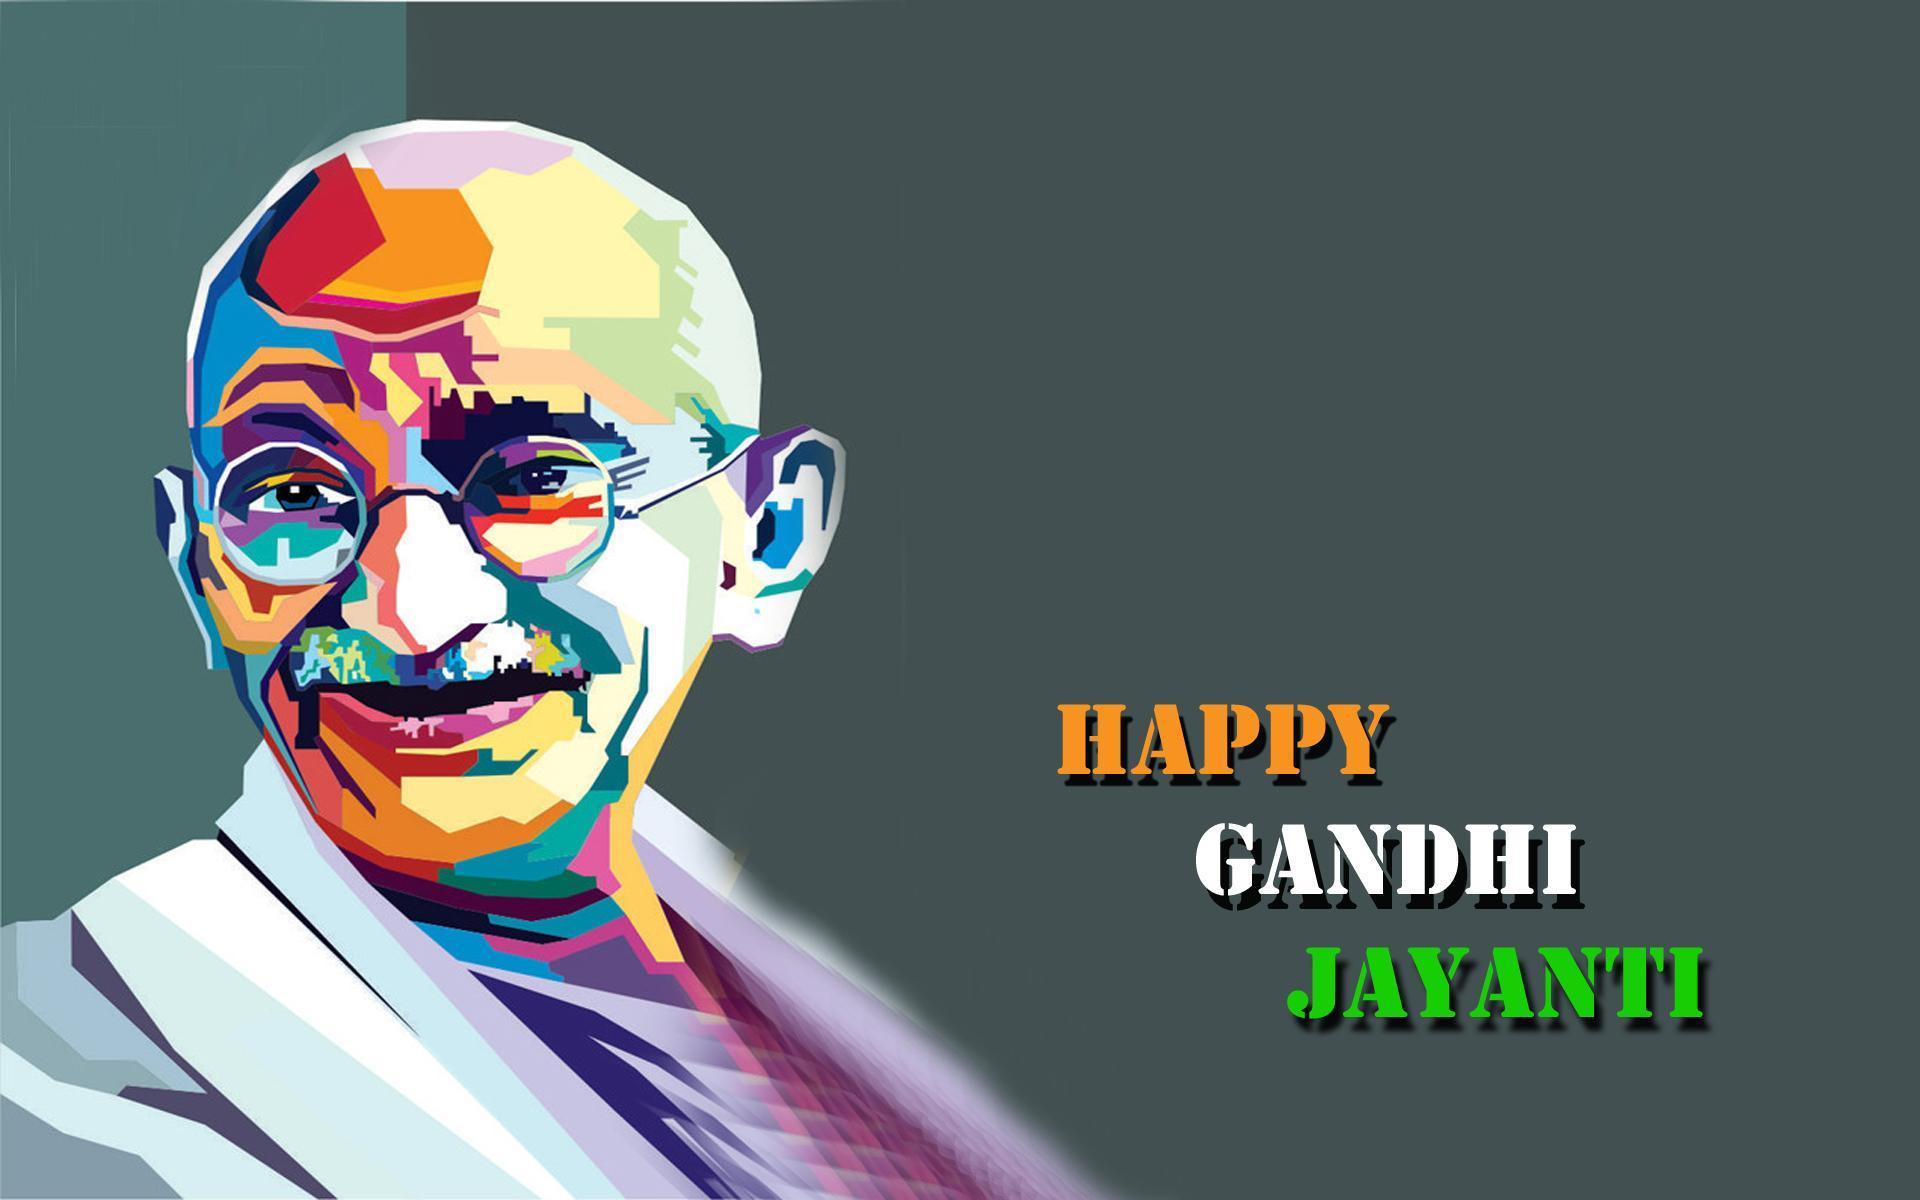 Happy Gandhi Jayanti 2015 for Android - APK Download